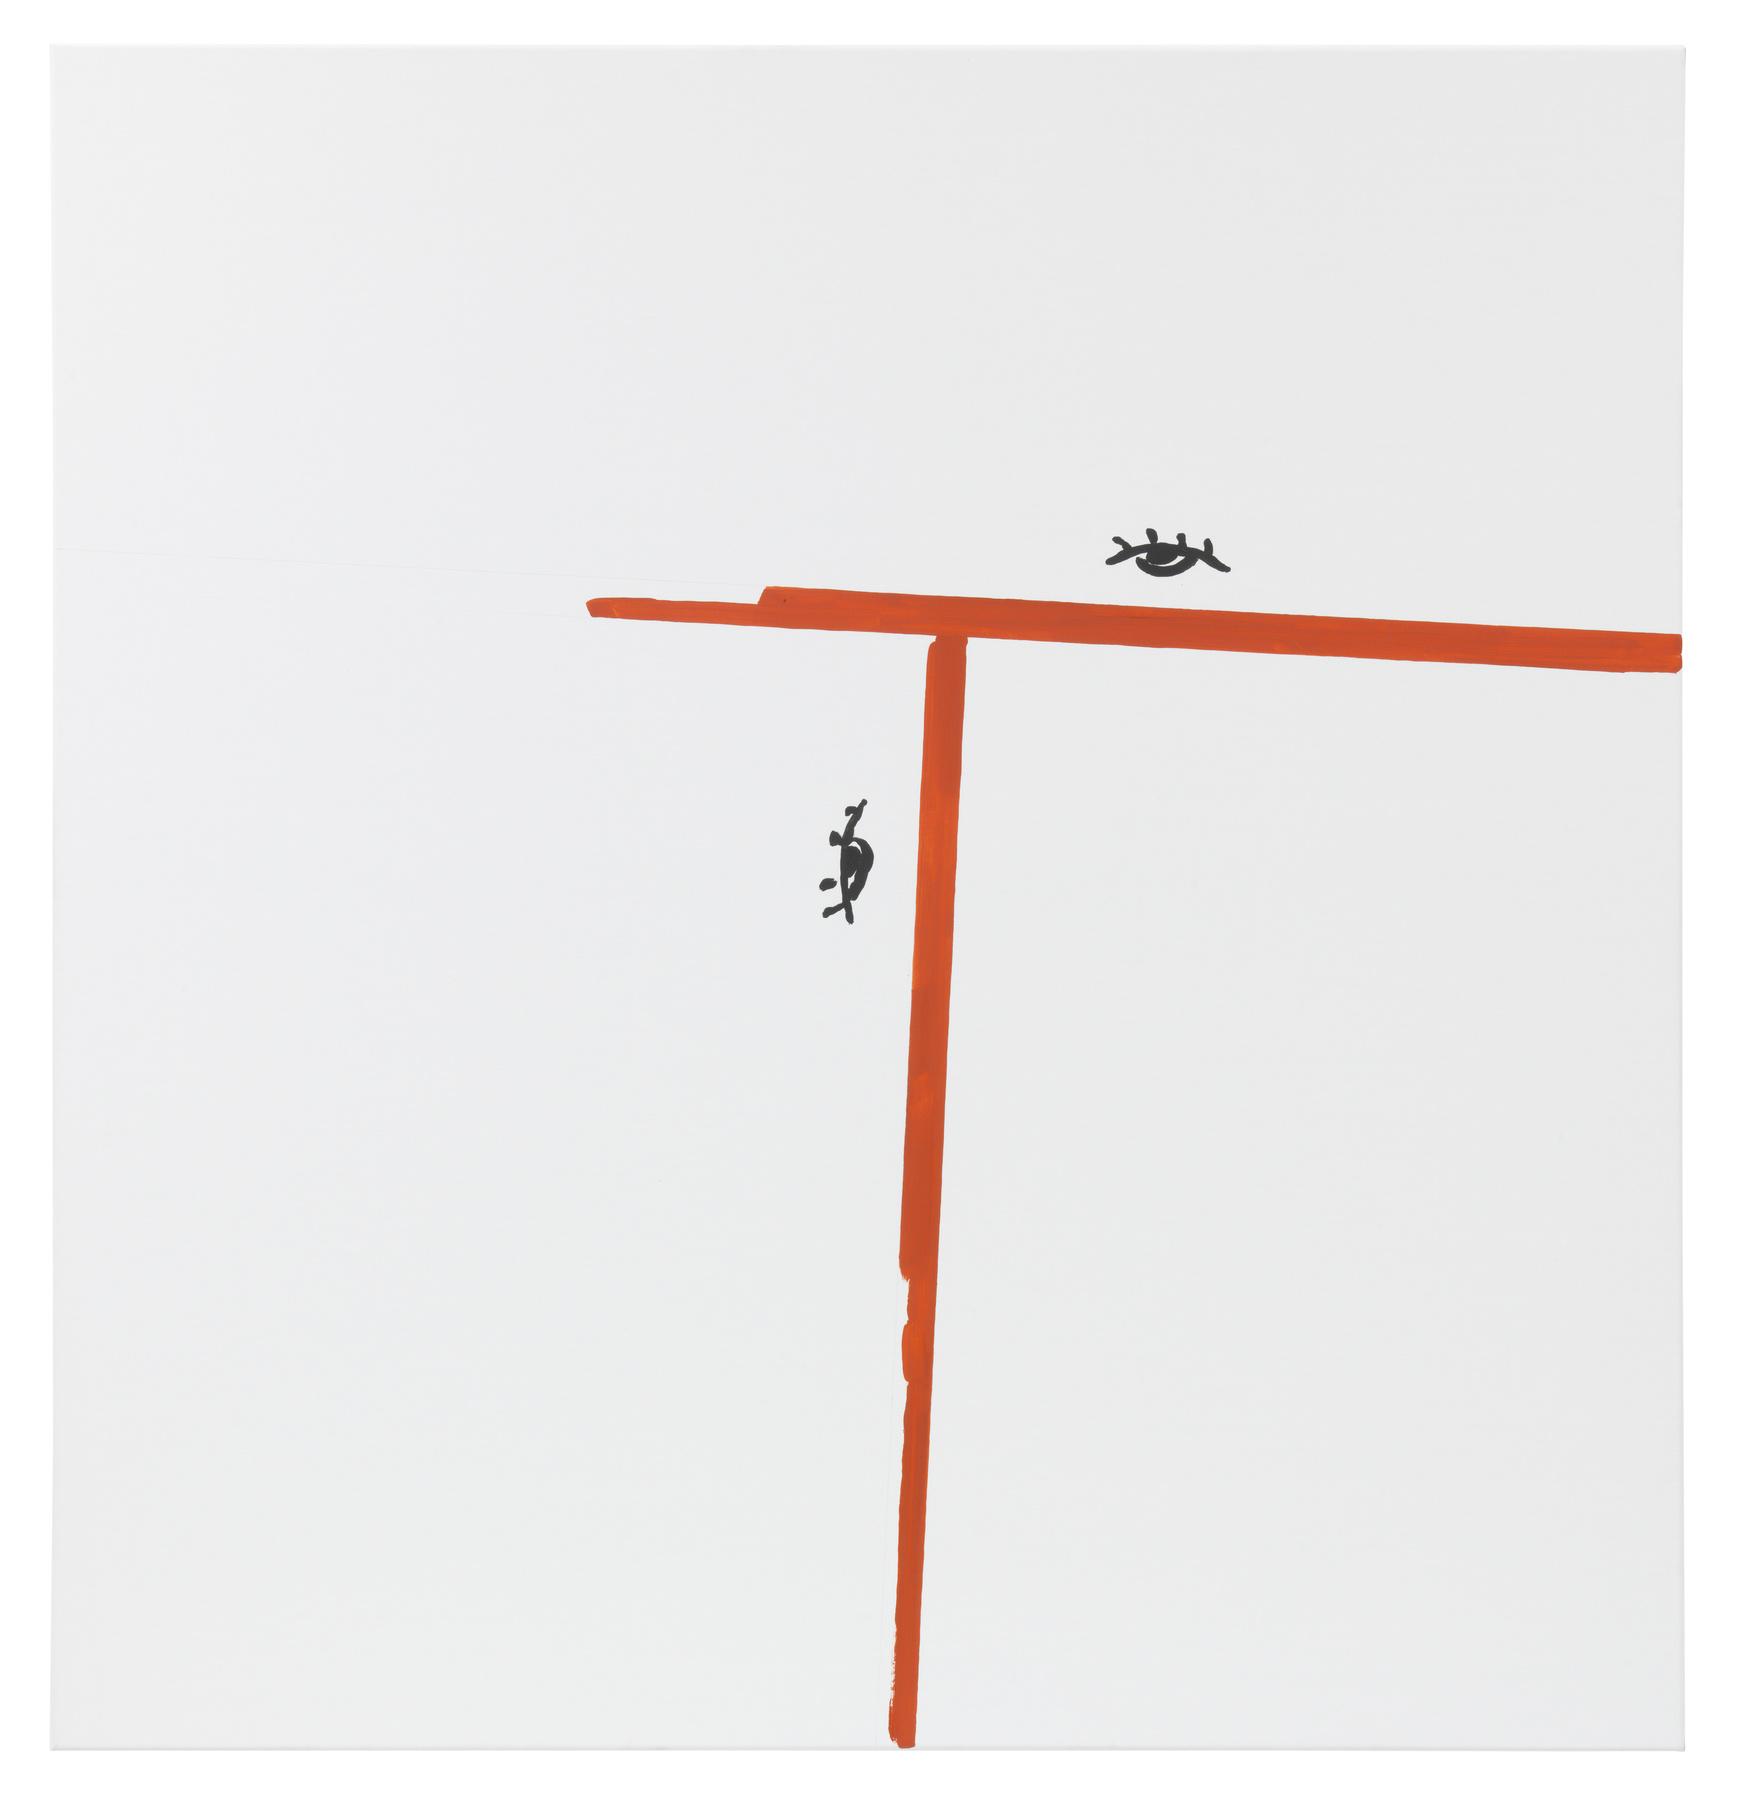 Galerie Joseph Tang _Alexander Lieck_Oci Ciornie_2015_07